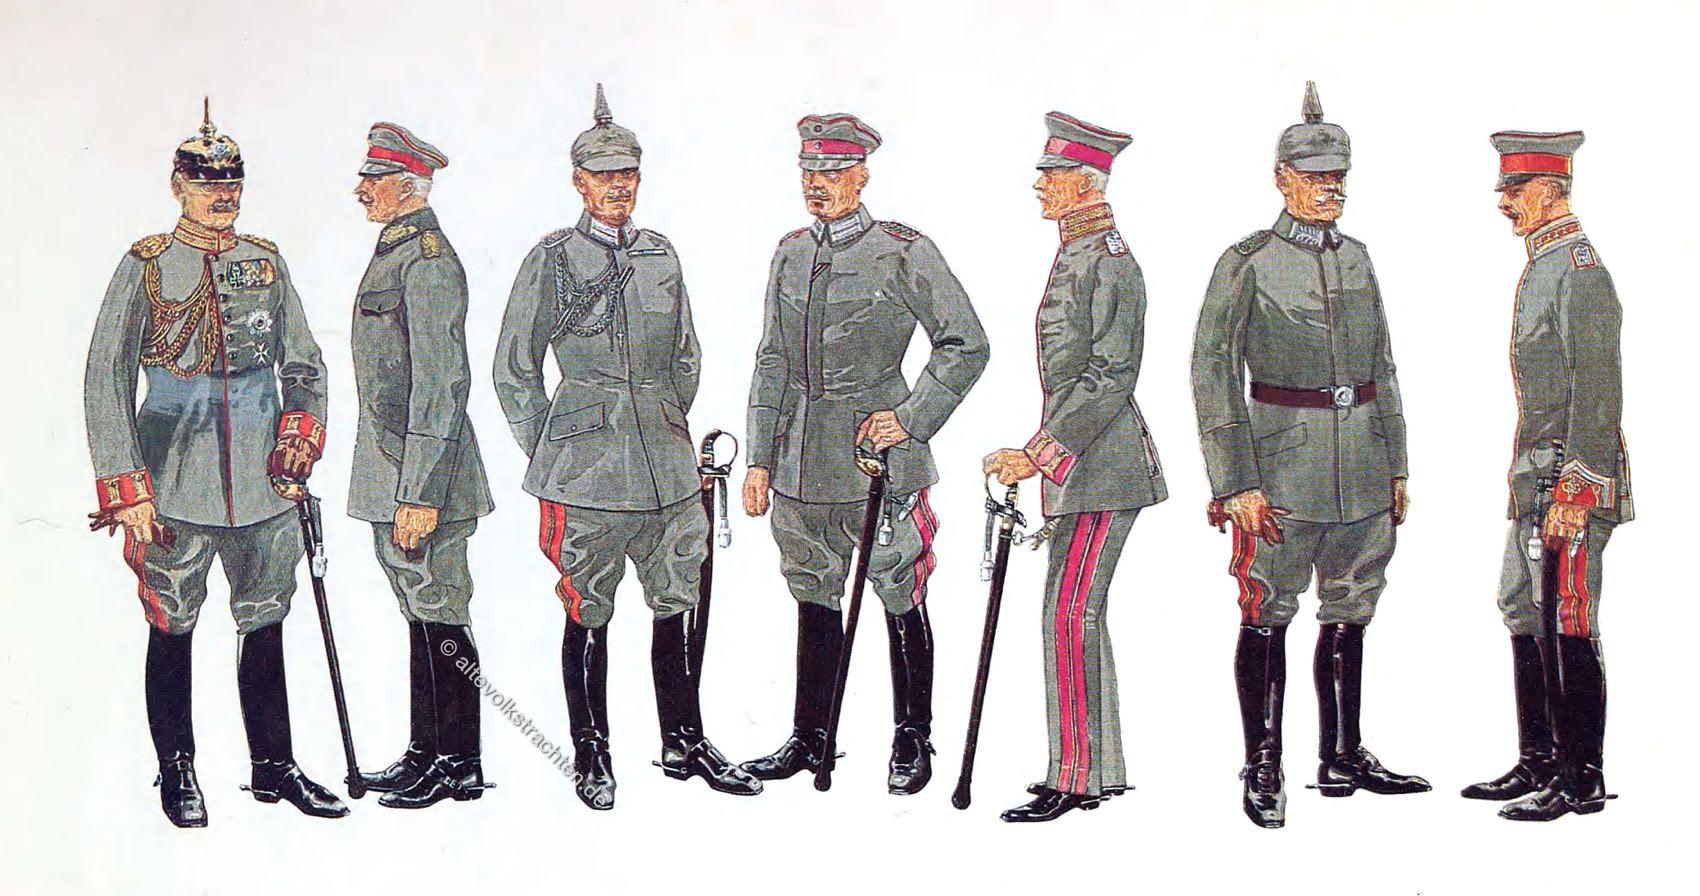 Uniformen, General-Adjutant, General der Infanterie, Flügel-Adjutant, Gr. Generalstab Major, Kriegsministerium Major, Militär-Kabinett Major, Persönlicher Adjutant der Prinzen